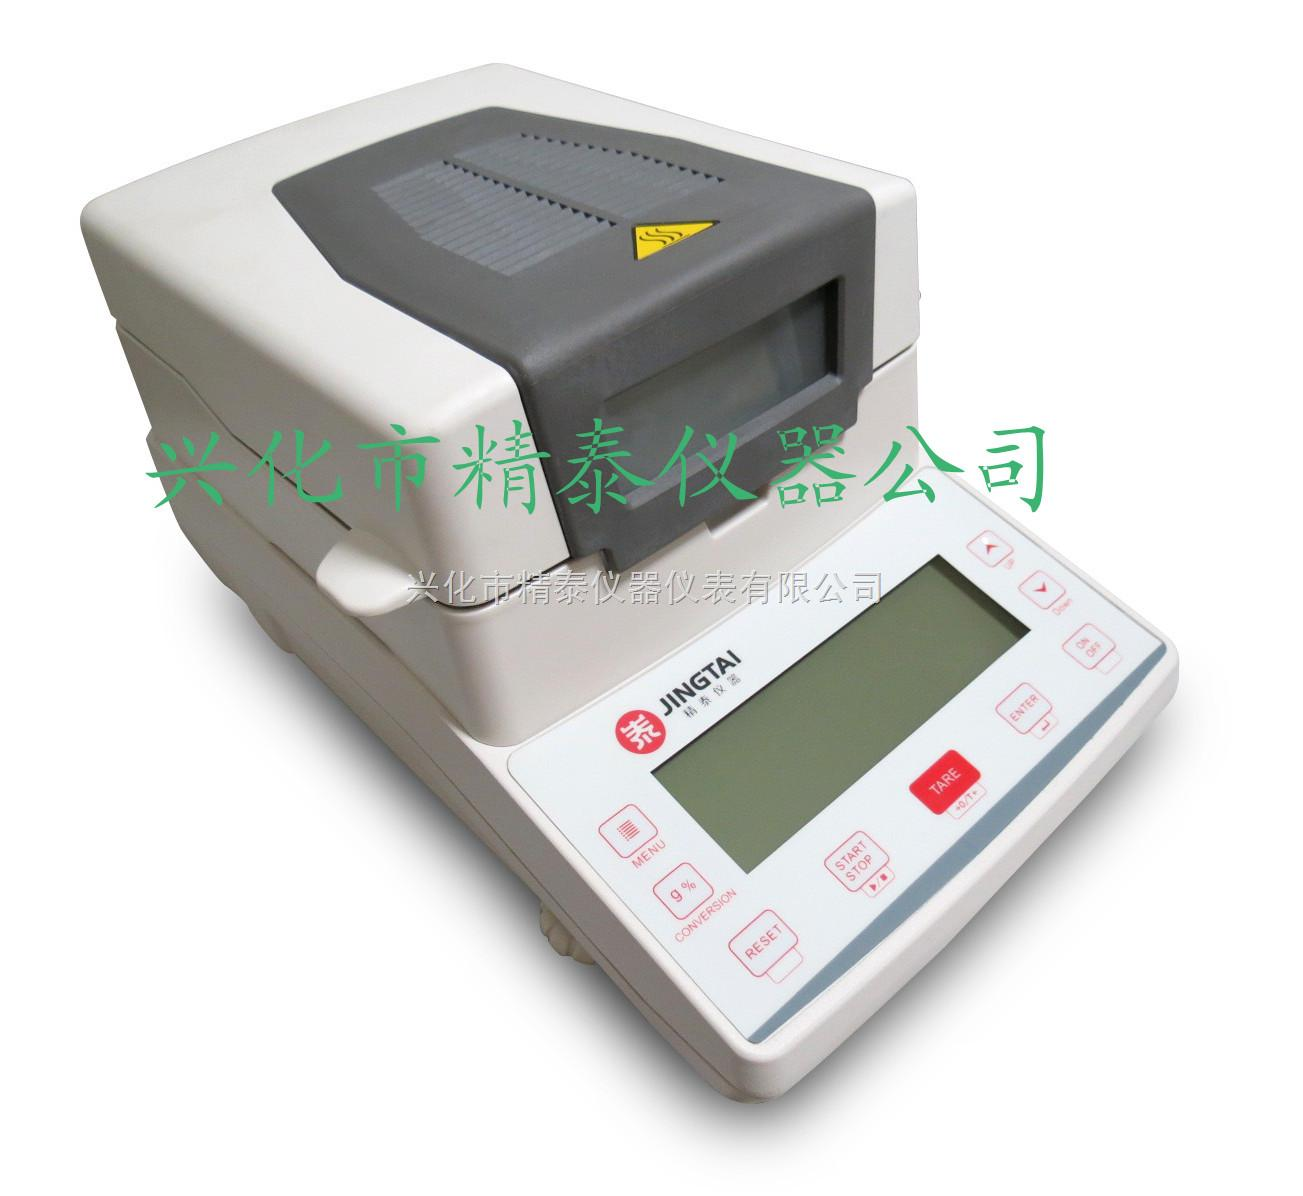 jt-k6-粮食水分仪 粮食水分测定仪 粮食水分检测仪图片